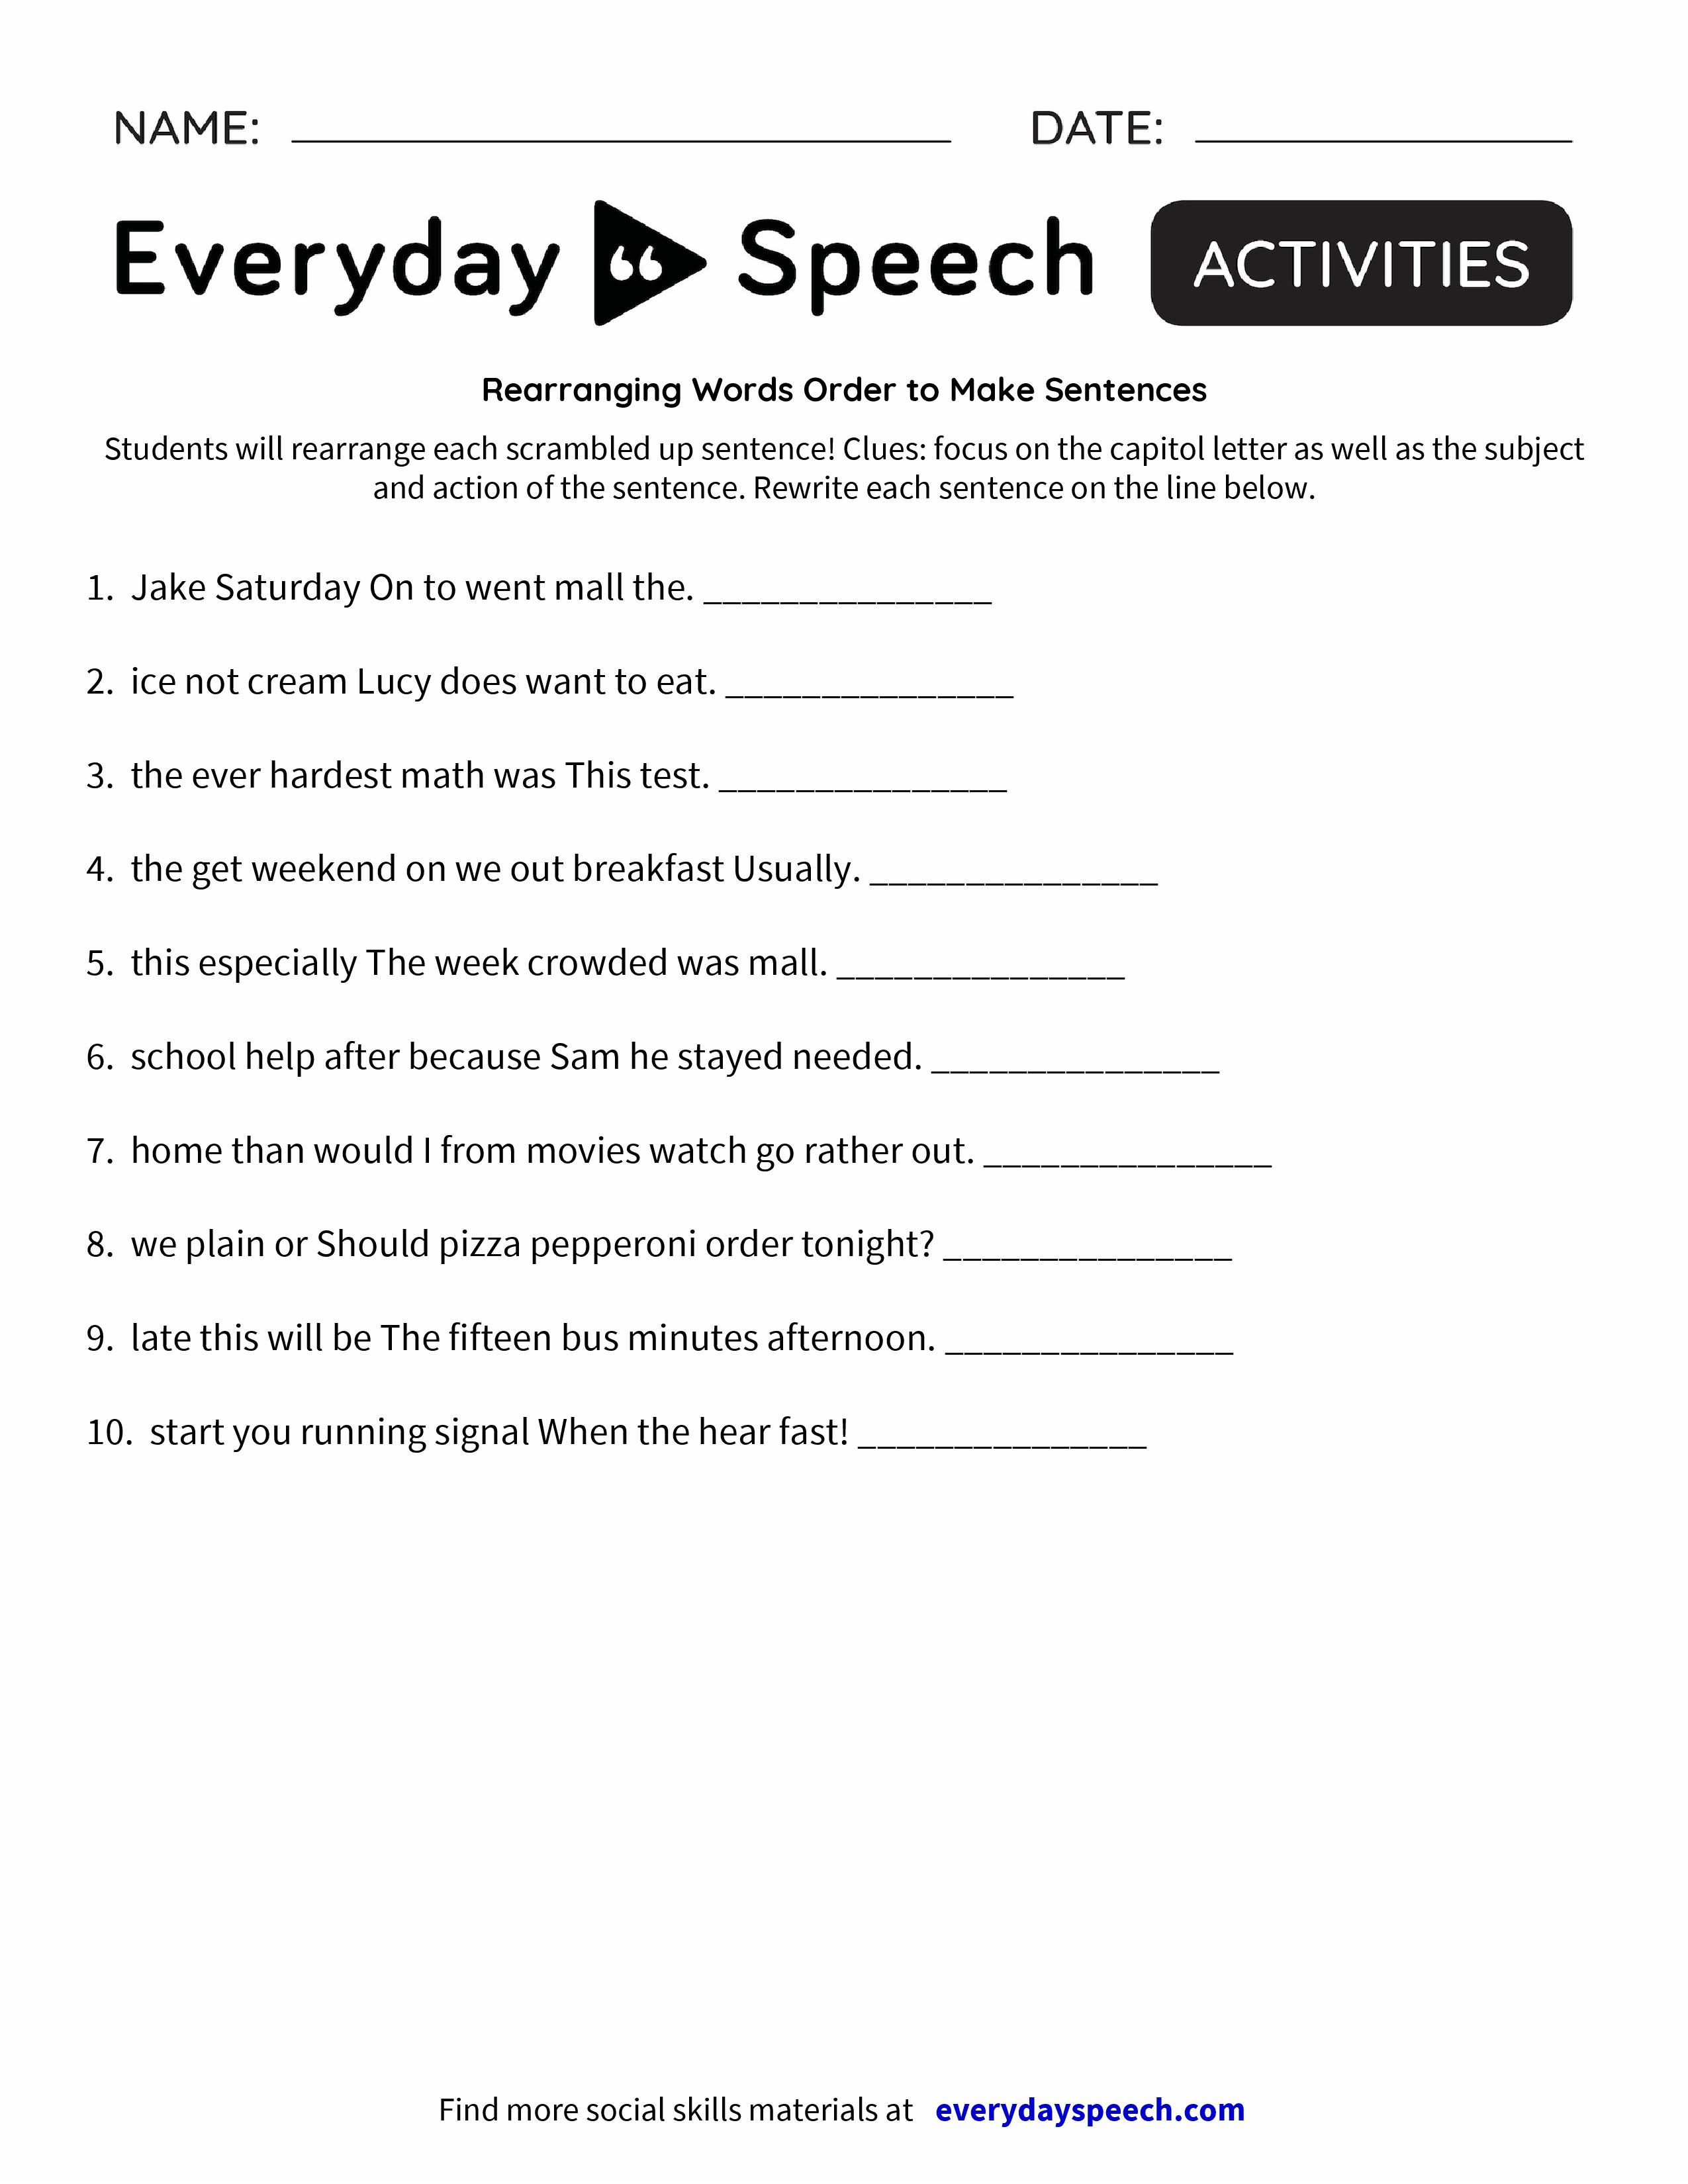 Re Rr Ng G W Ds Der To M Ke Sentences Everyd Y Speech